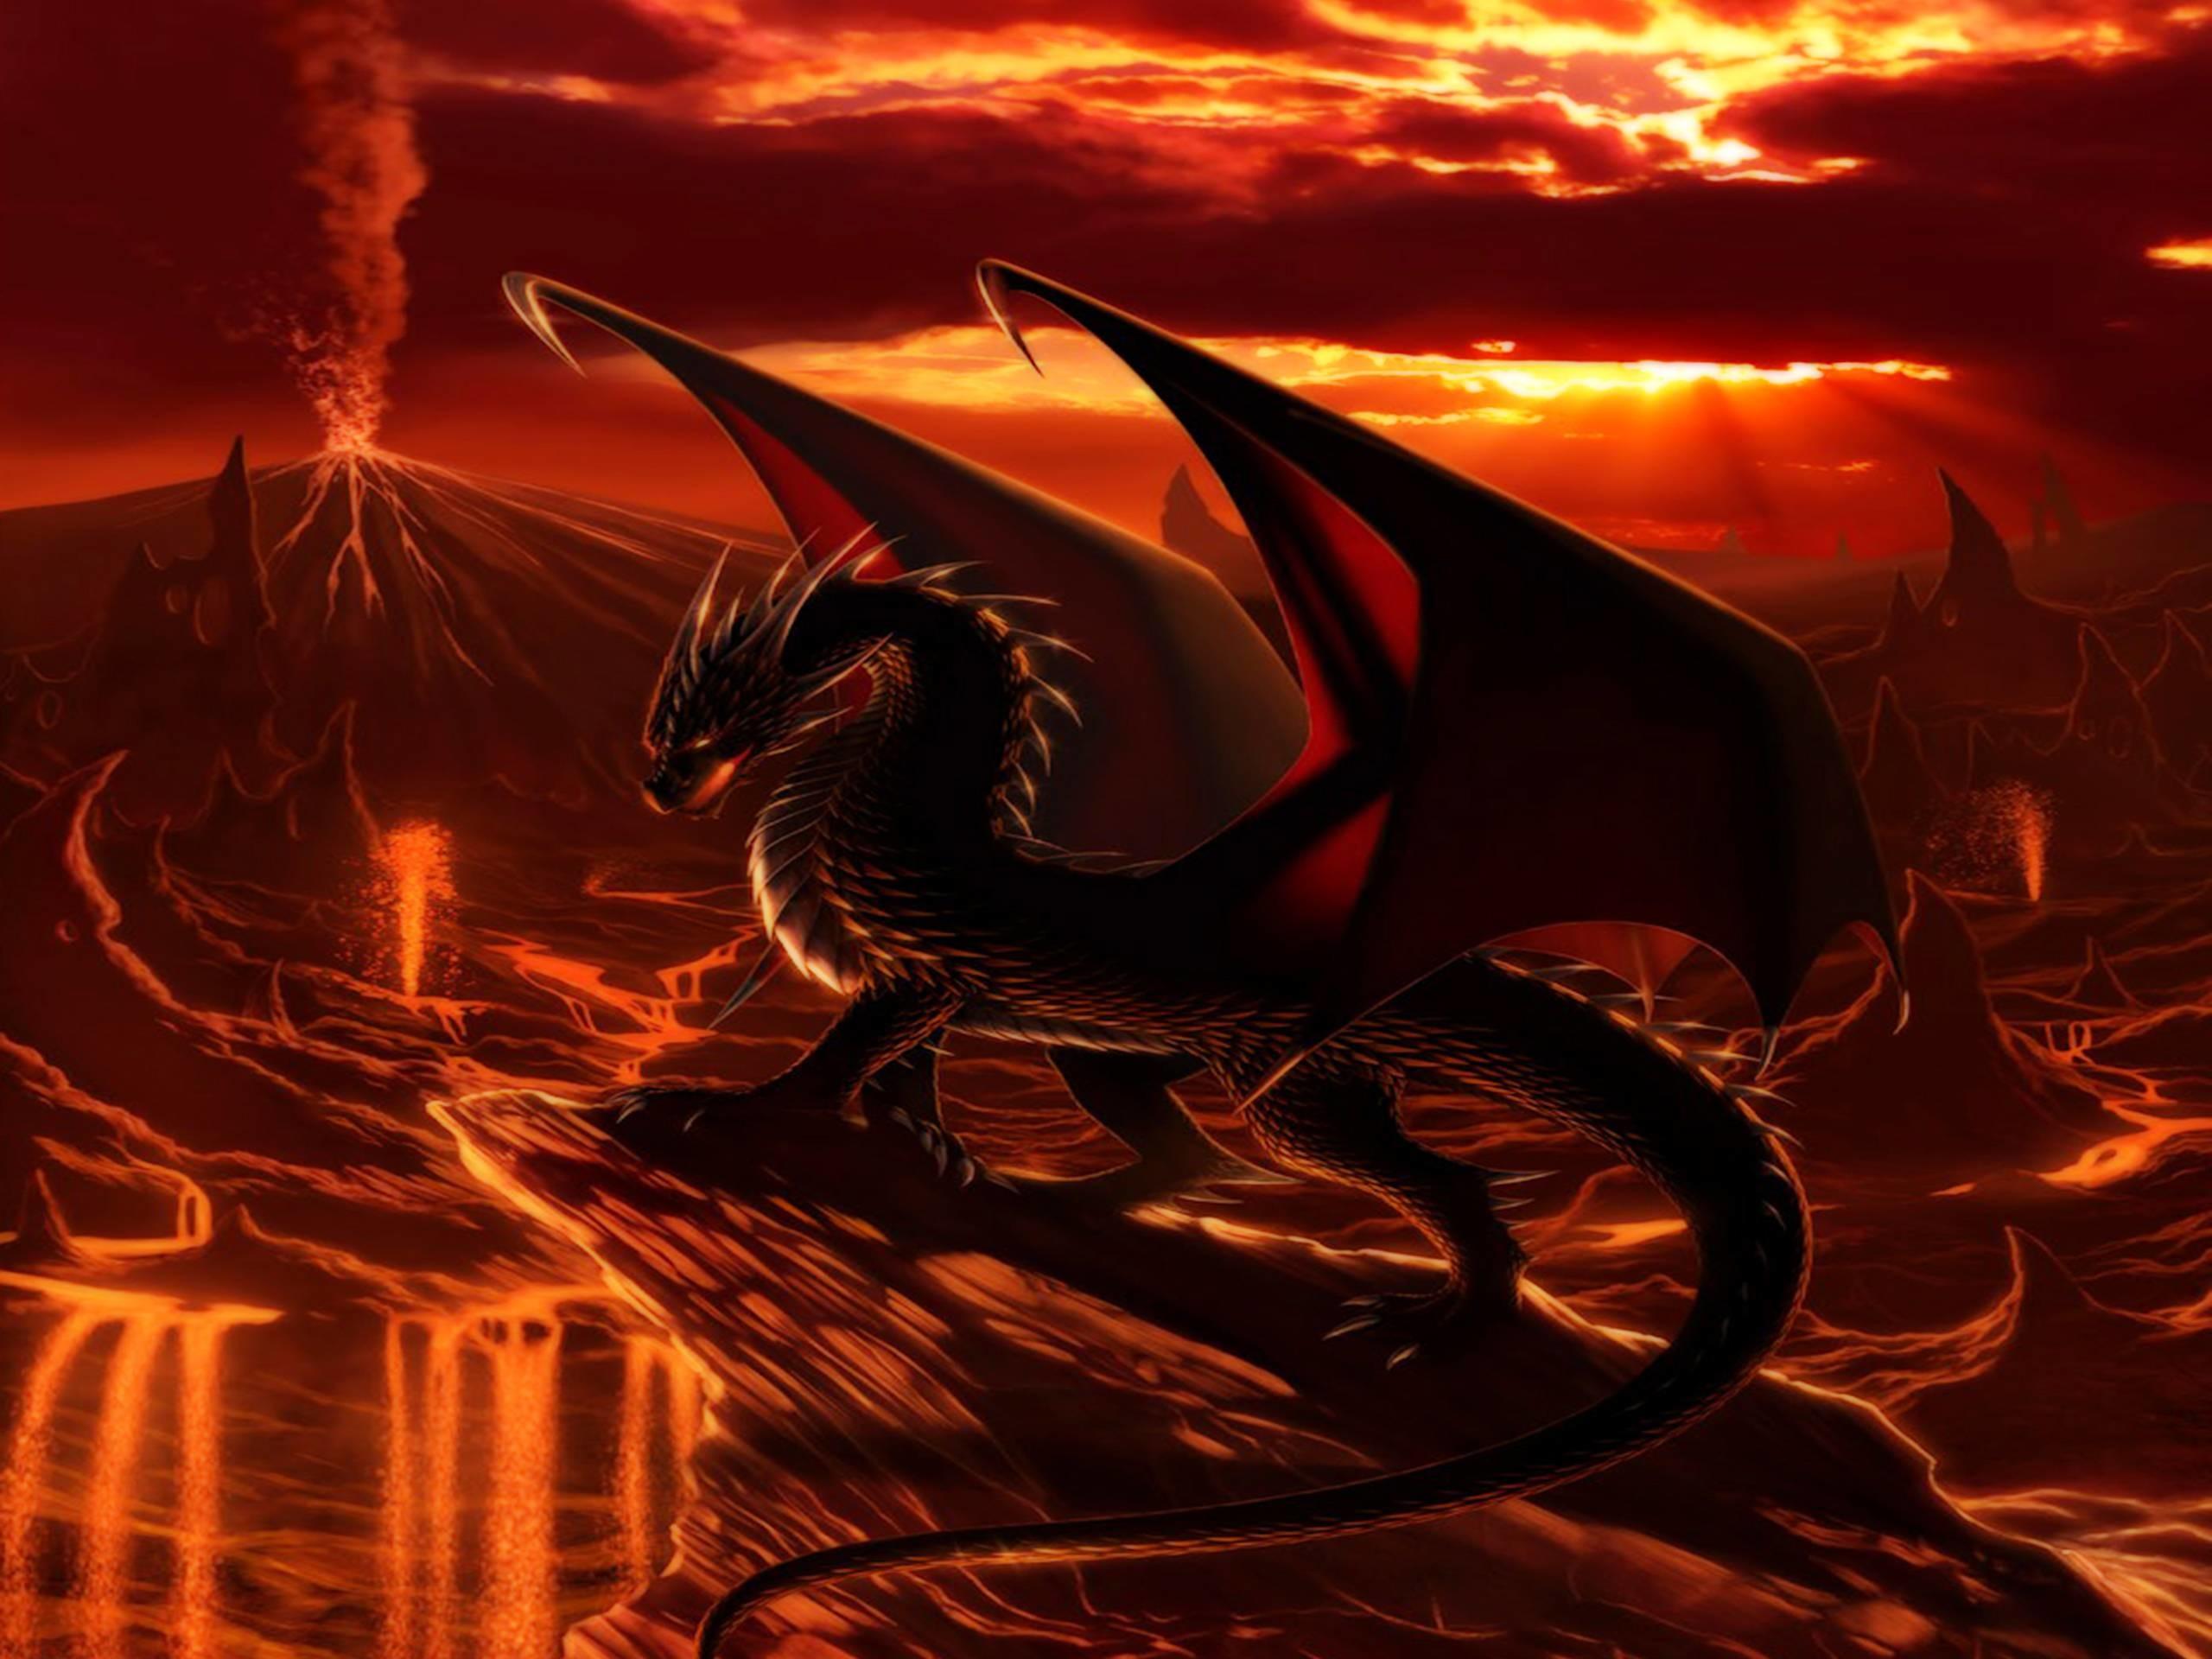 Red Dragon Wallpaper 1